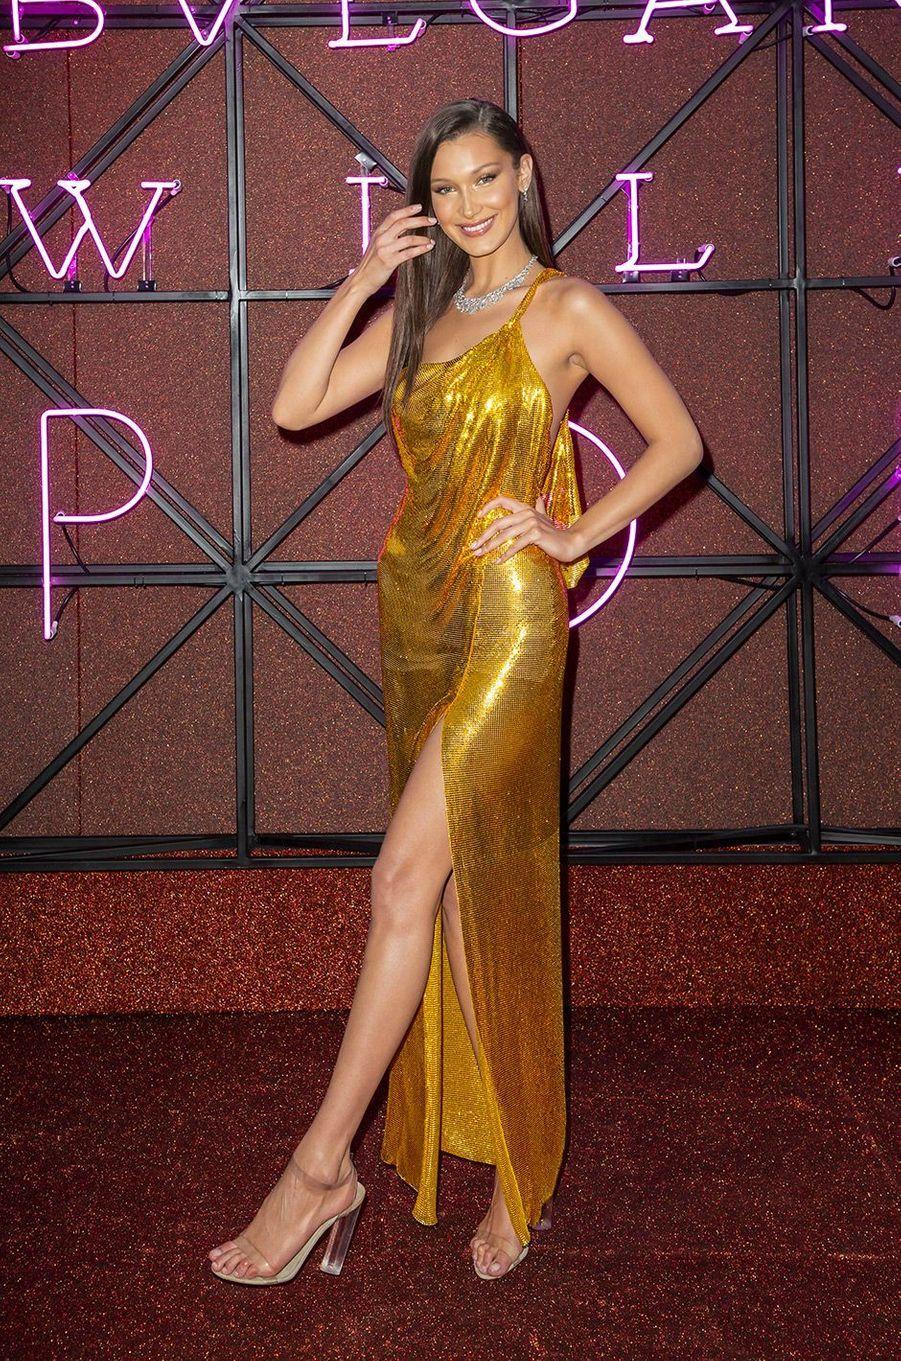 Bella Hadid au Gala Bulgari à Rome, jeudi 28 juin 2018